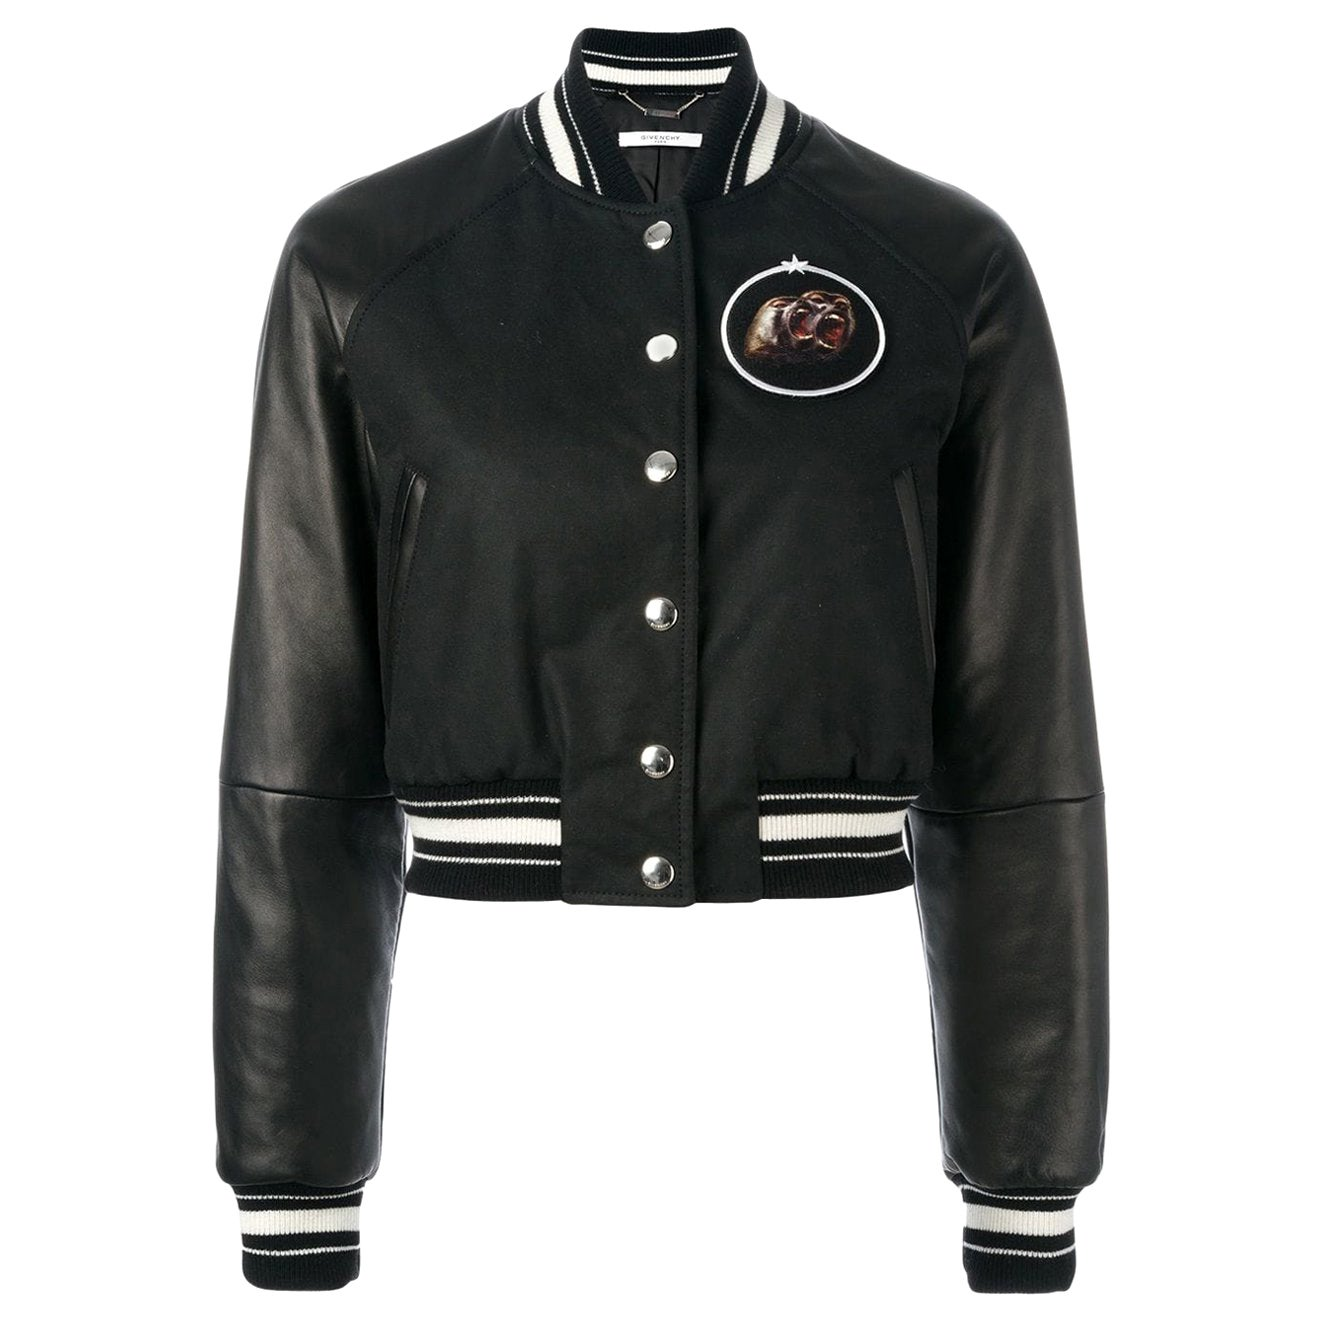 Givenchy Cropped Bomber Jacket